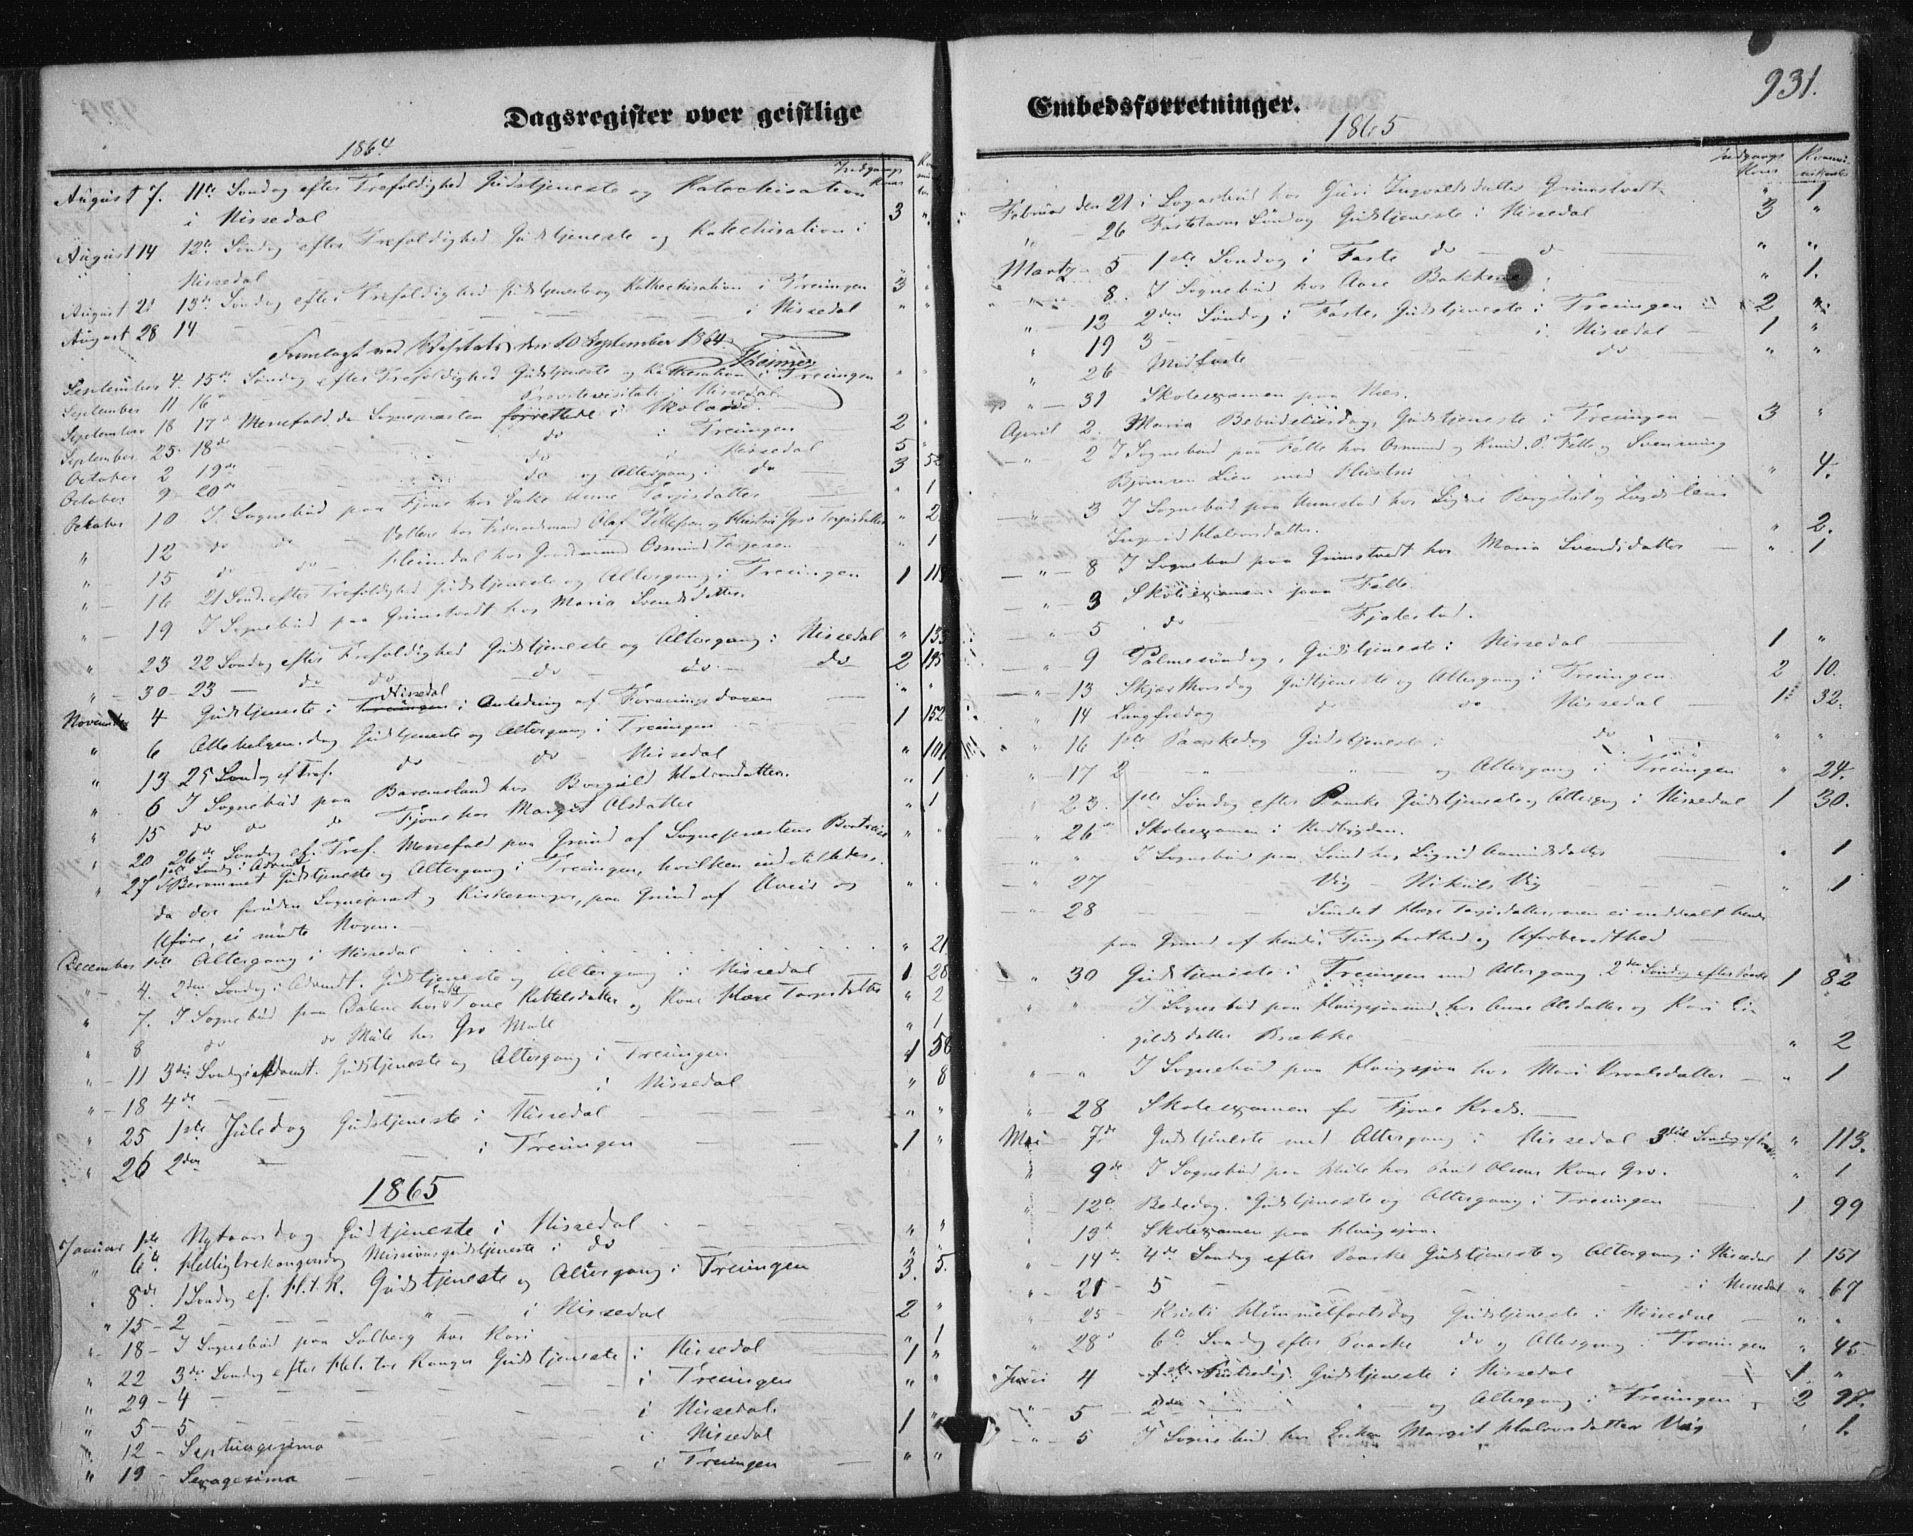 SAKO, Nissedal kirkebøker, F/Fa/L0003: Ministerialbok nr. I 3, 1846-1870, s. 930-931